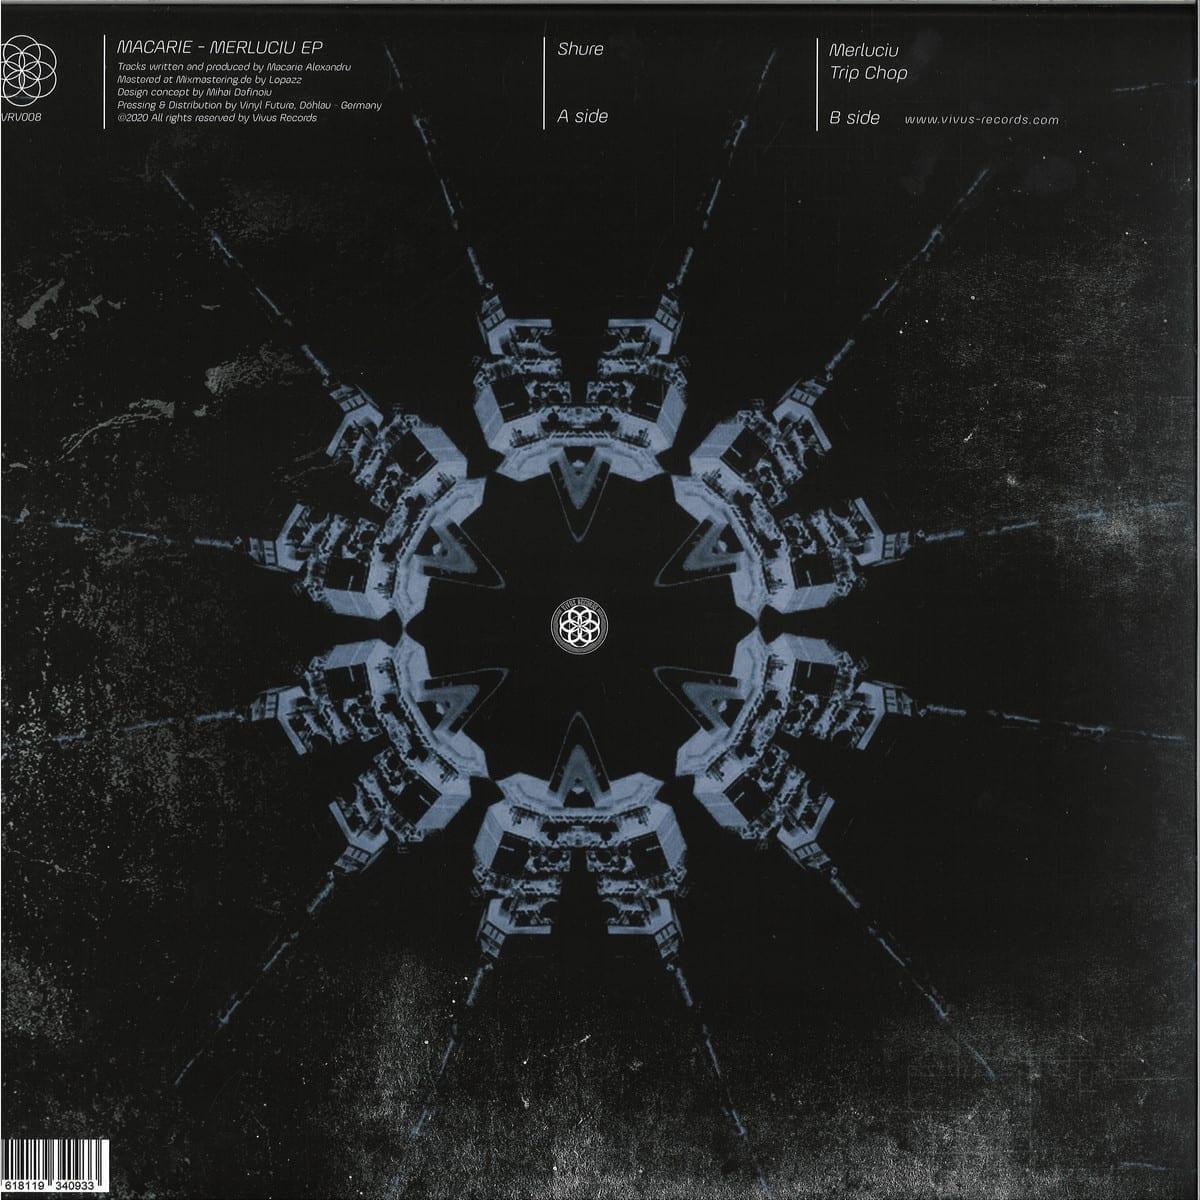 macarie - merluciu [vivus records] 03